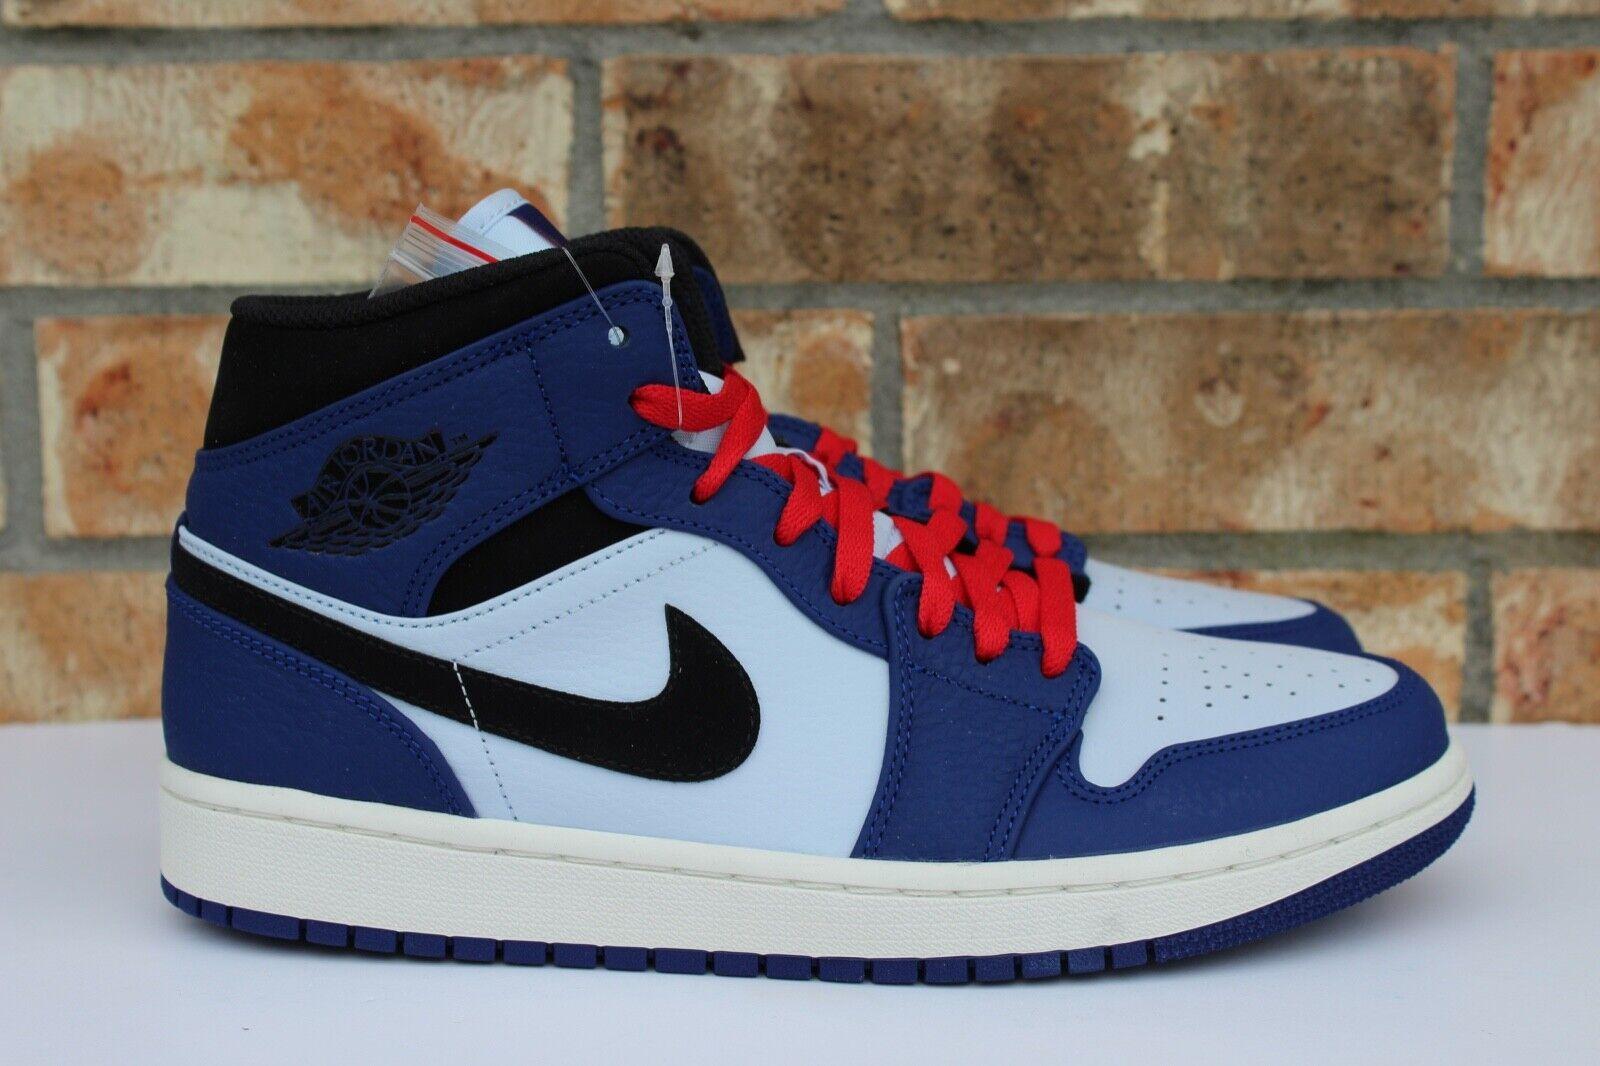 Men's Nike Air Jordan 1 Retro Mid SE Deep Royal bluee Black Red White 852542-400